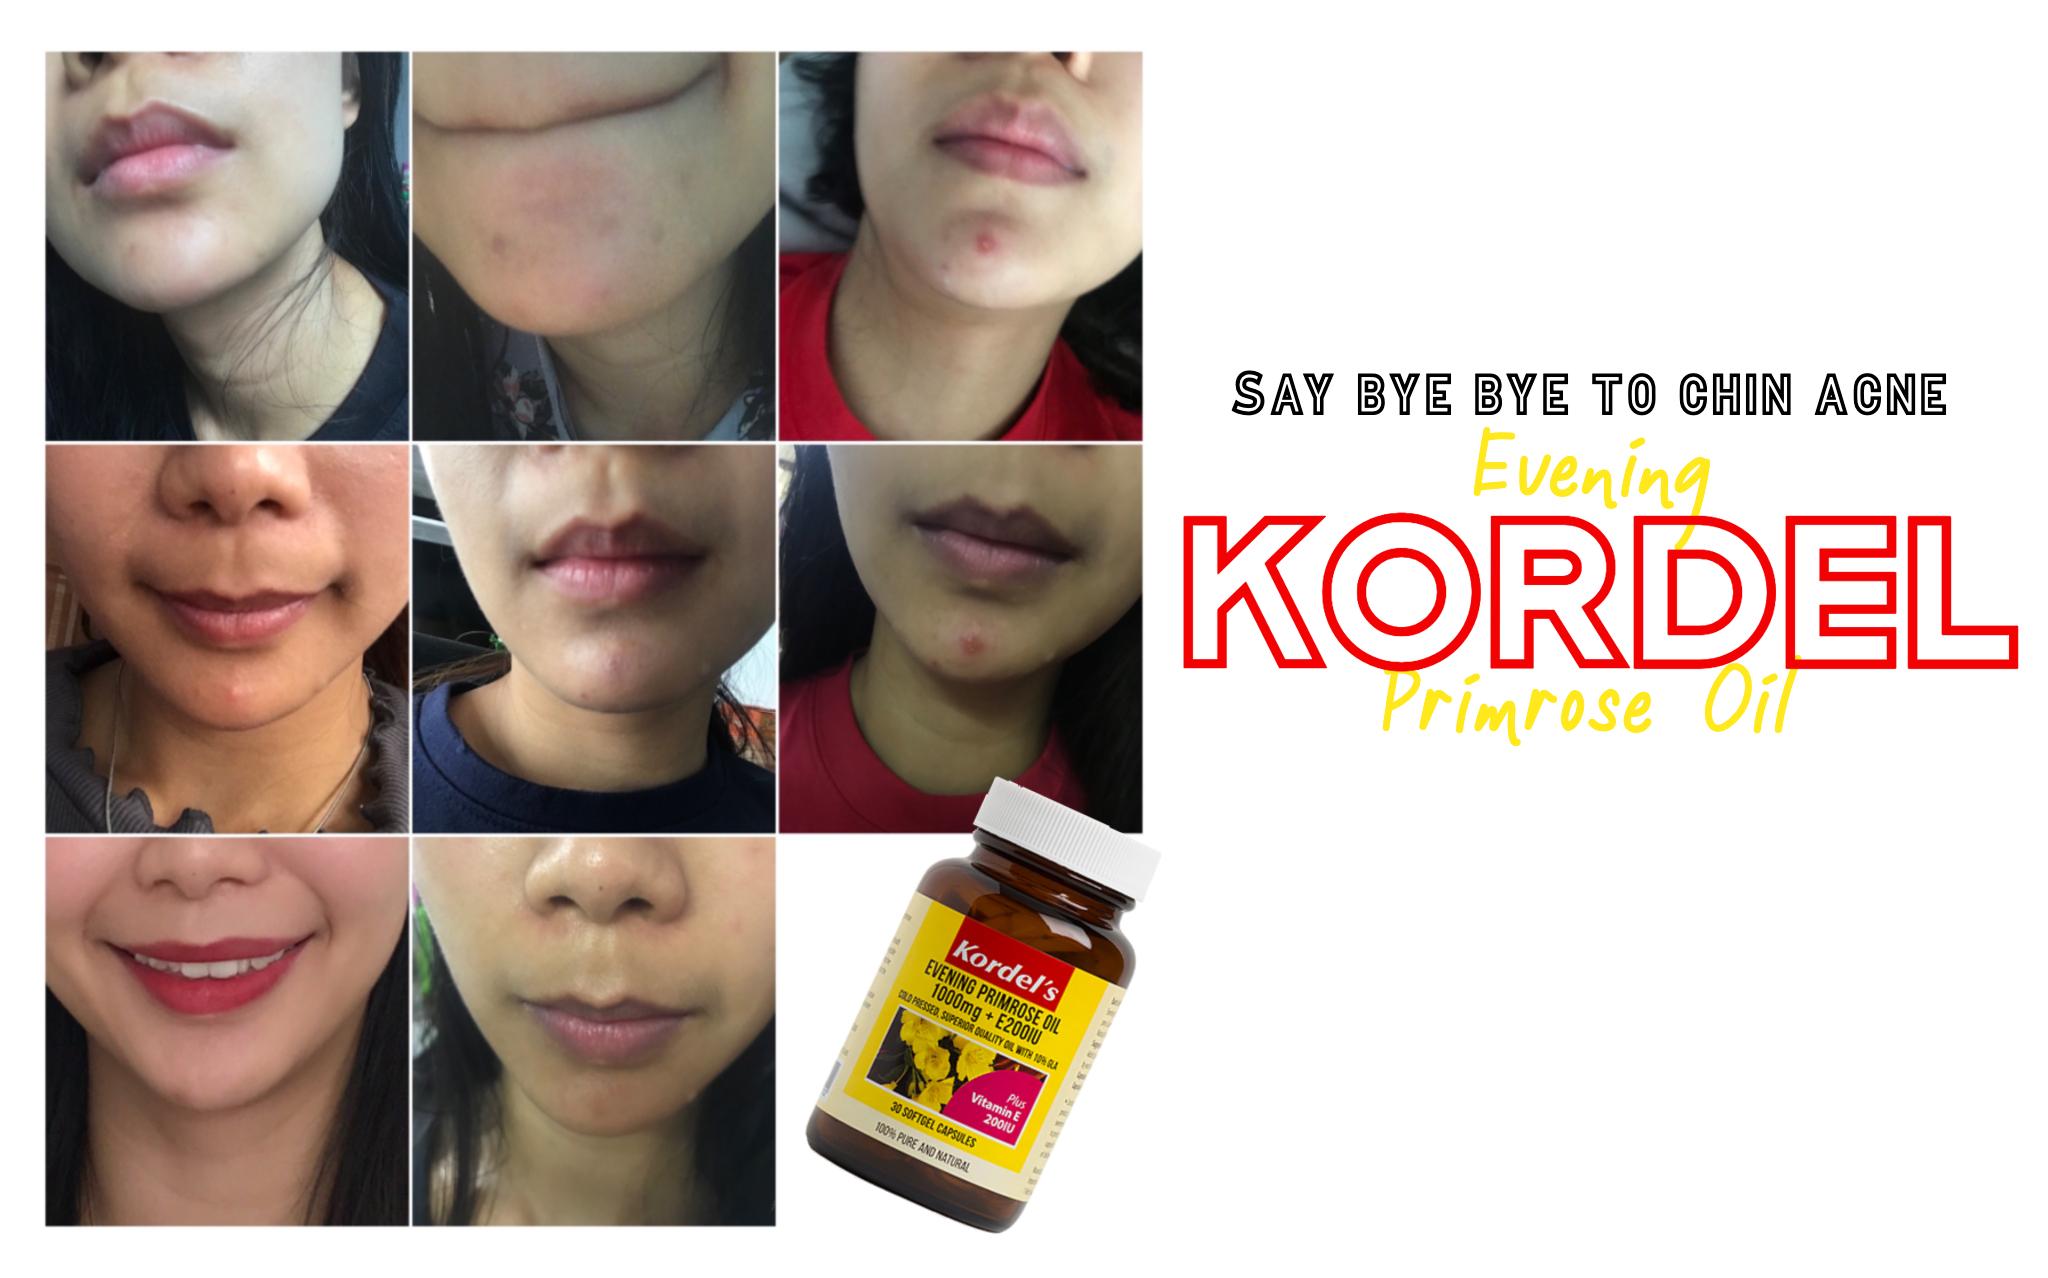 kordel evening primrose oil hormonal chin acne cure treatment